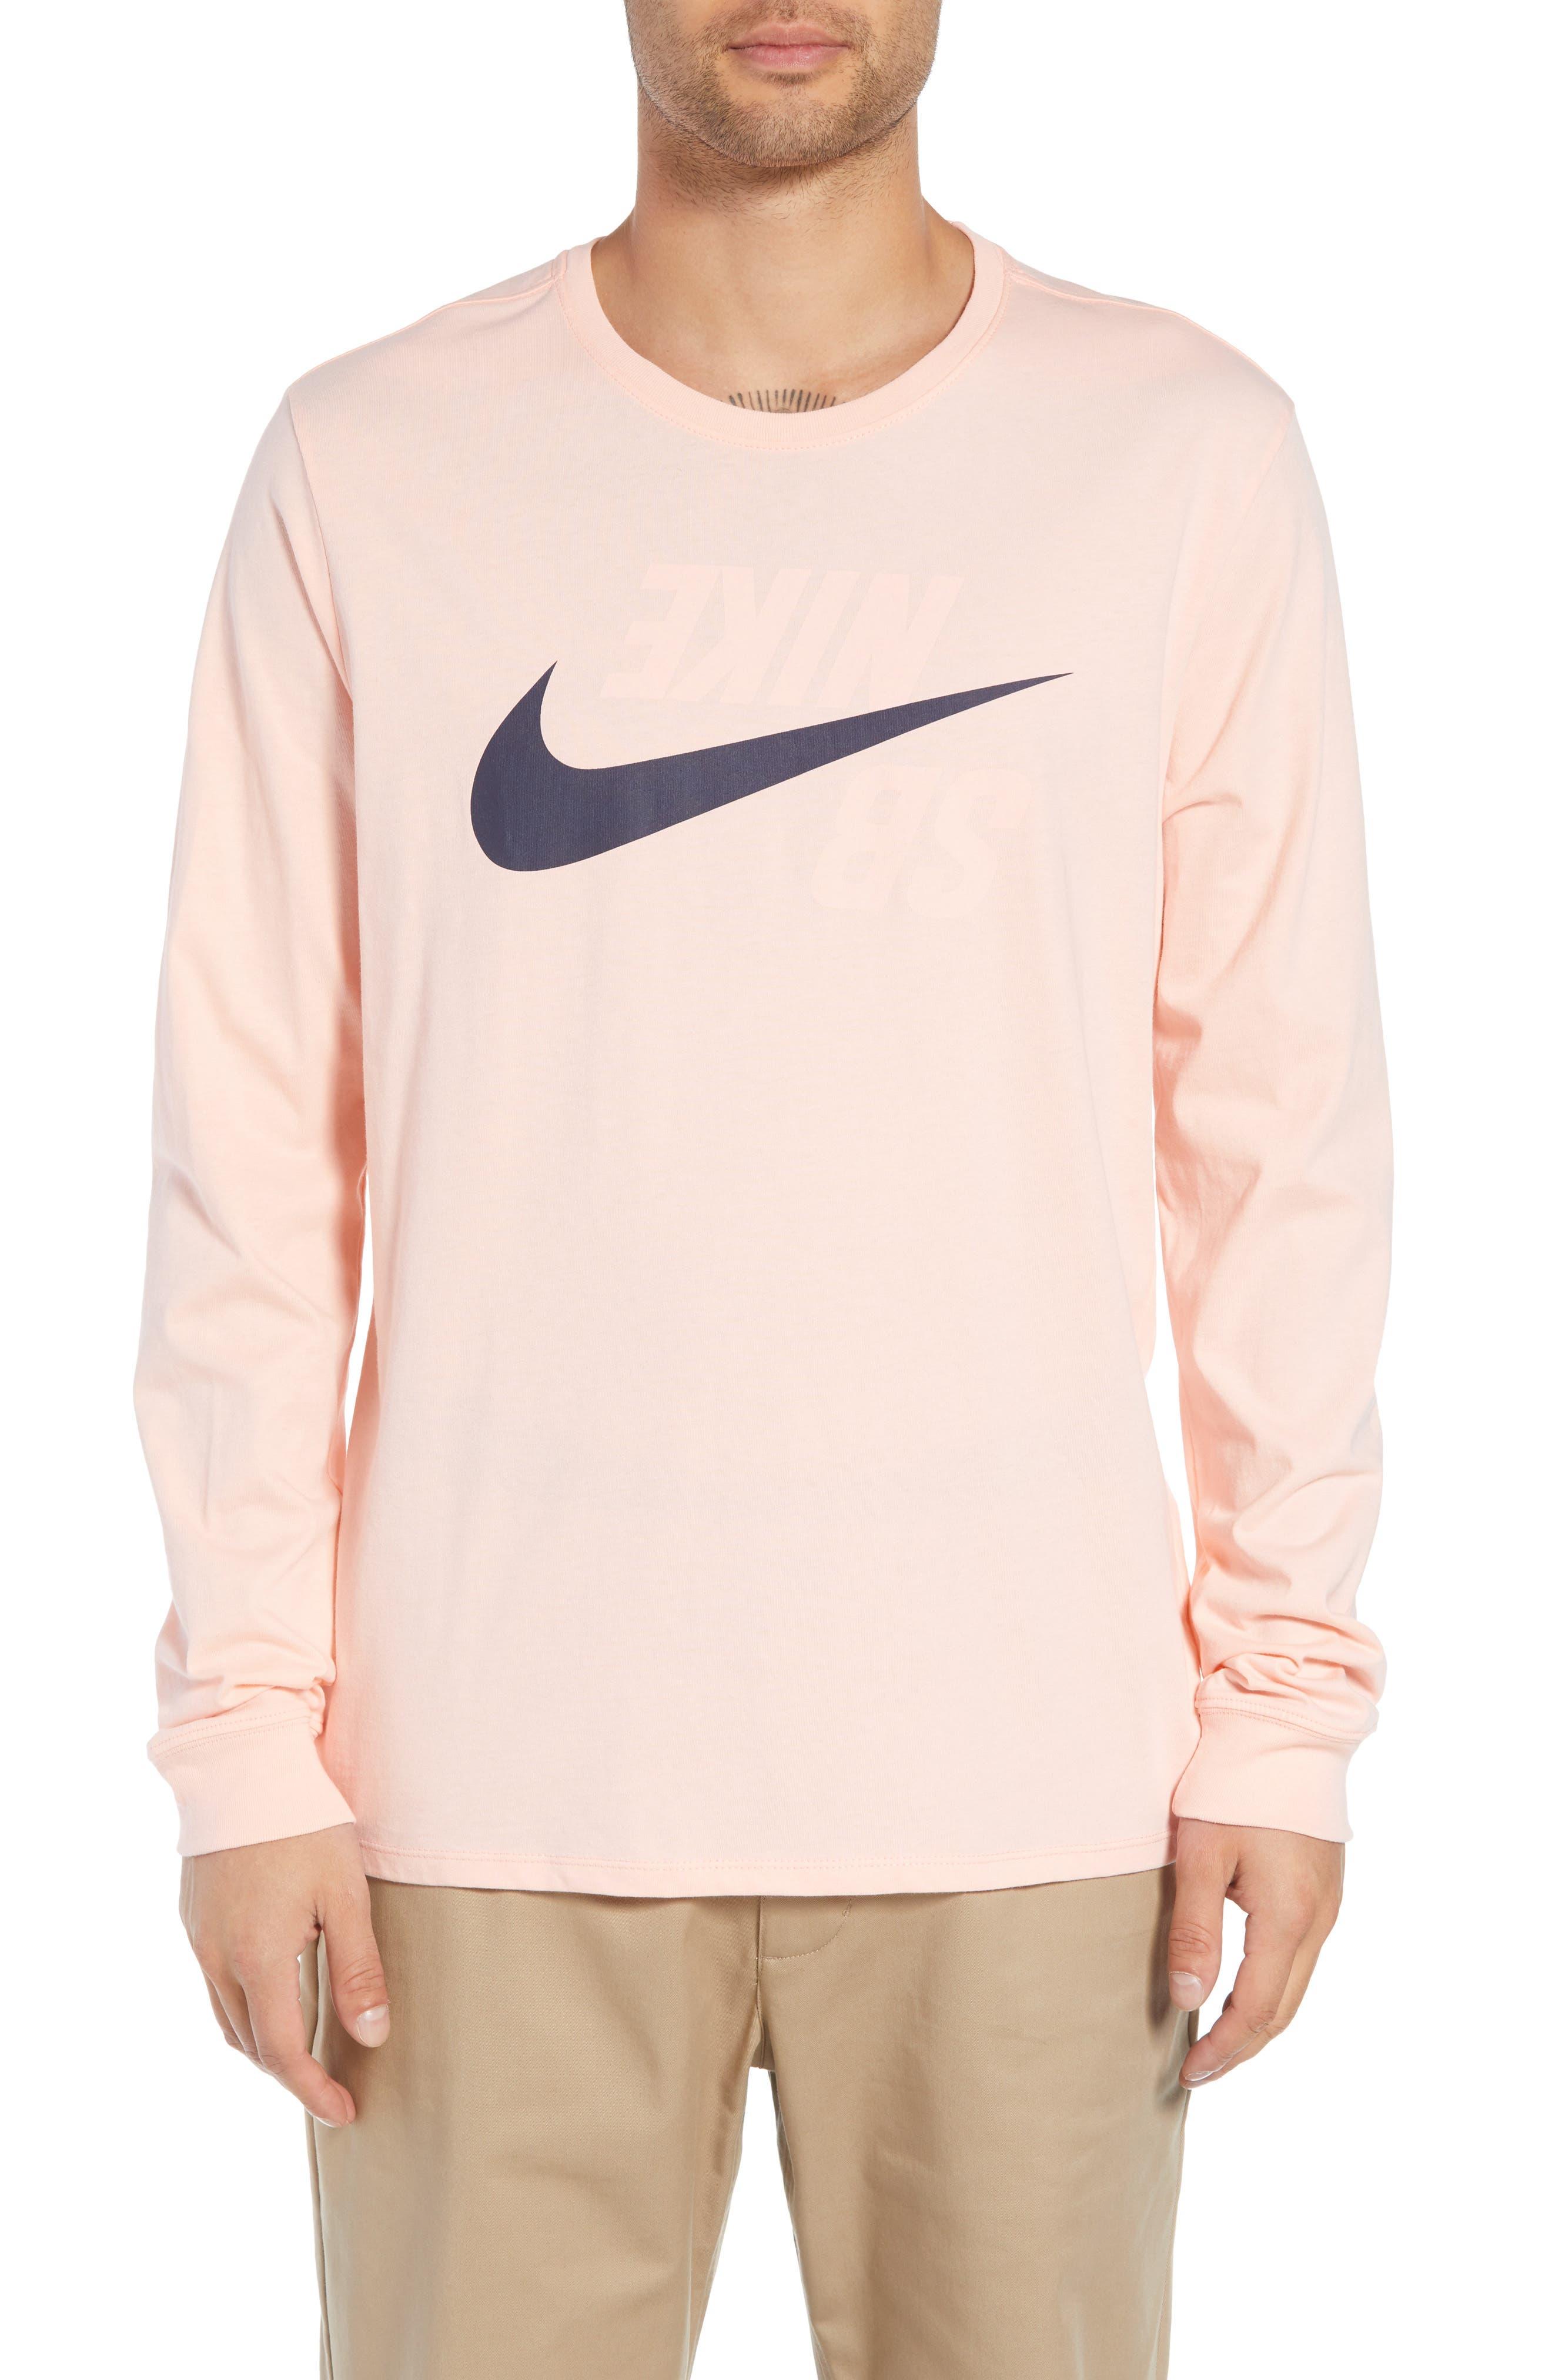 Nike Sb Backwards Long Sleeve T-Shirt, Pink